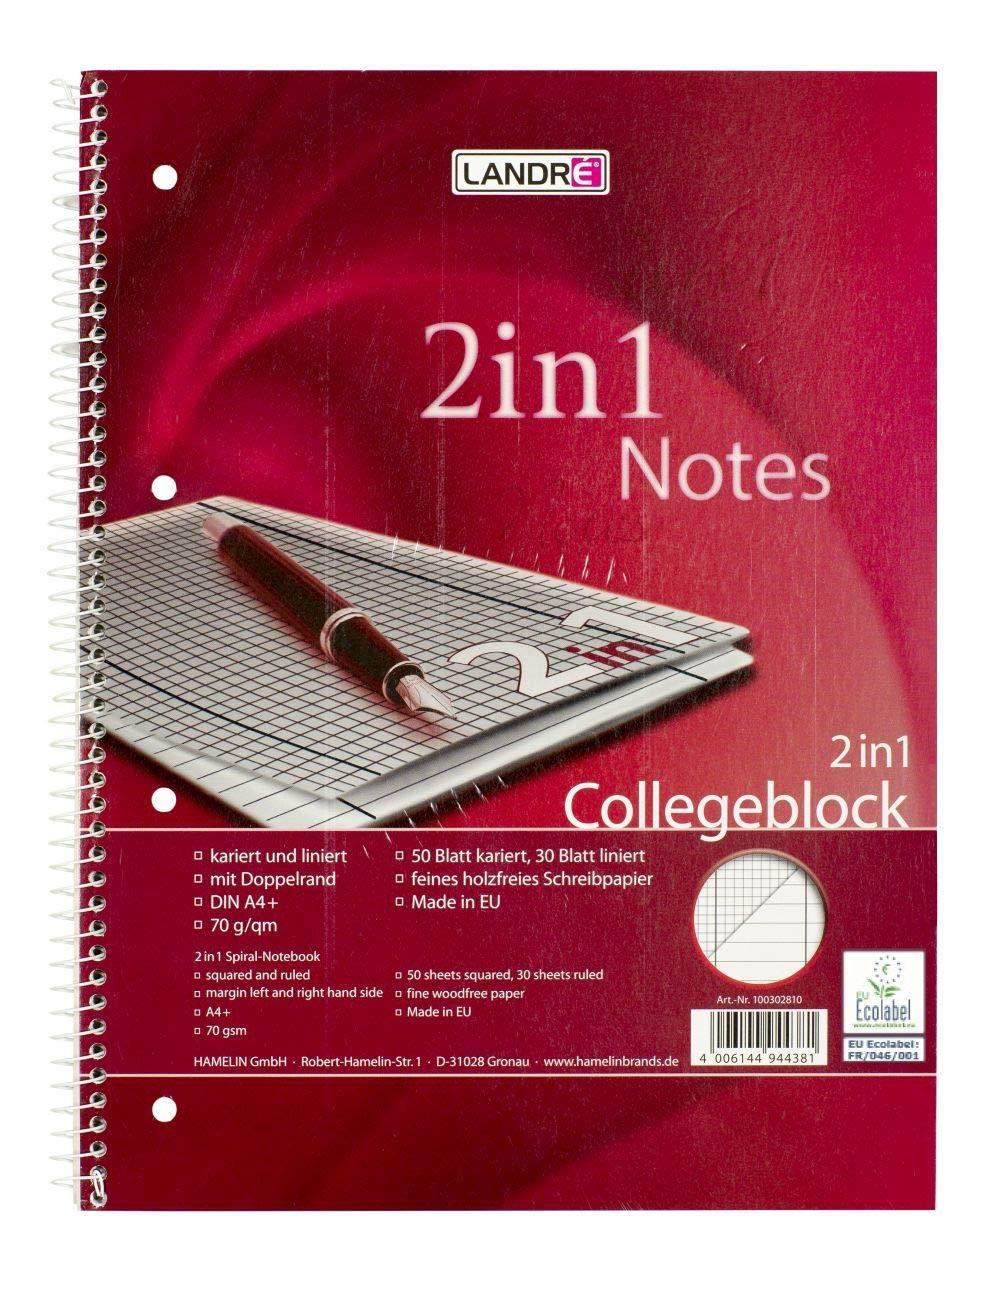 LANDRE 100302810 Collegeblock 2 in 1 10er Pack linirt und kariert Rand links A4 80 Blatt 70 g/m² gelocht Hamelin GmbH